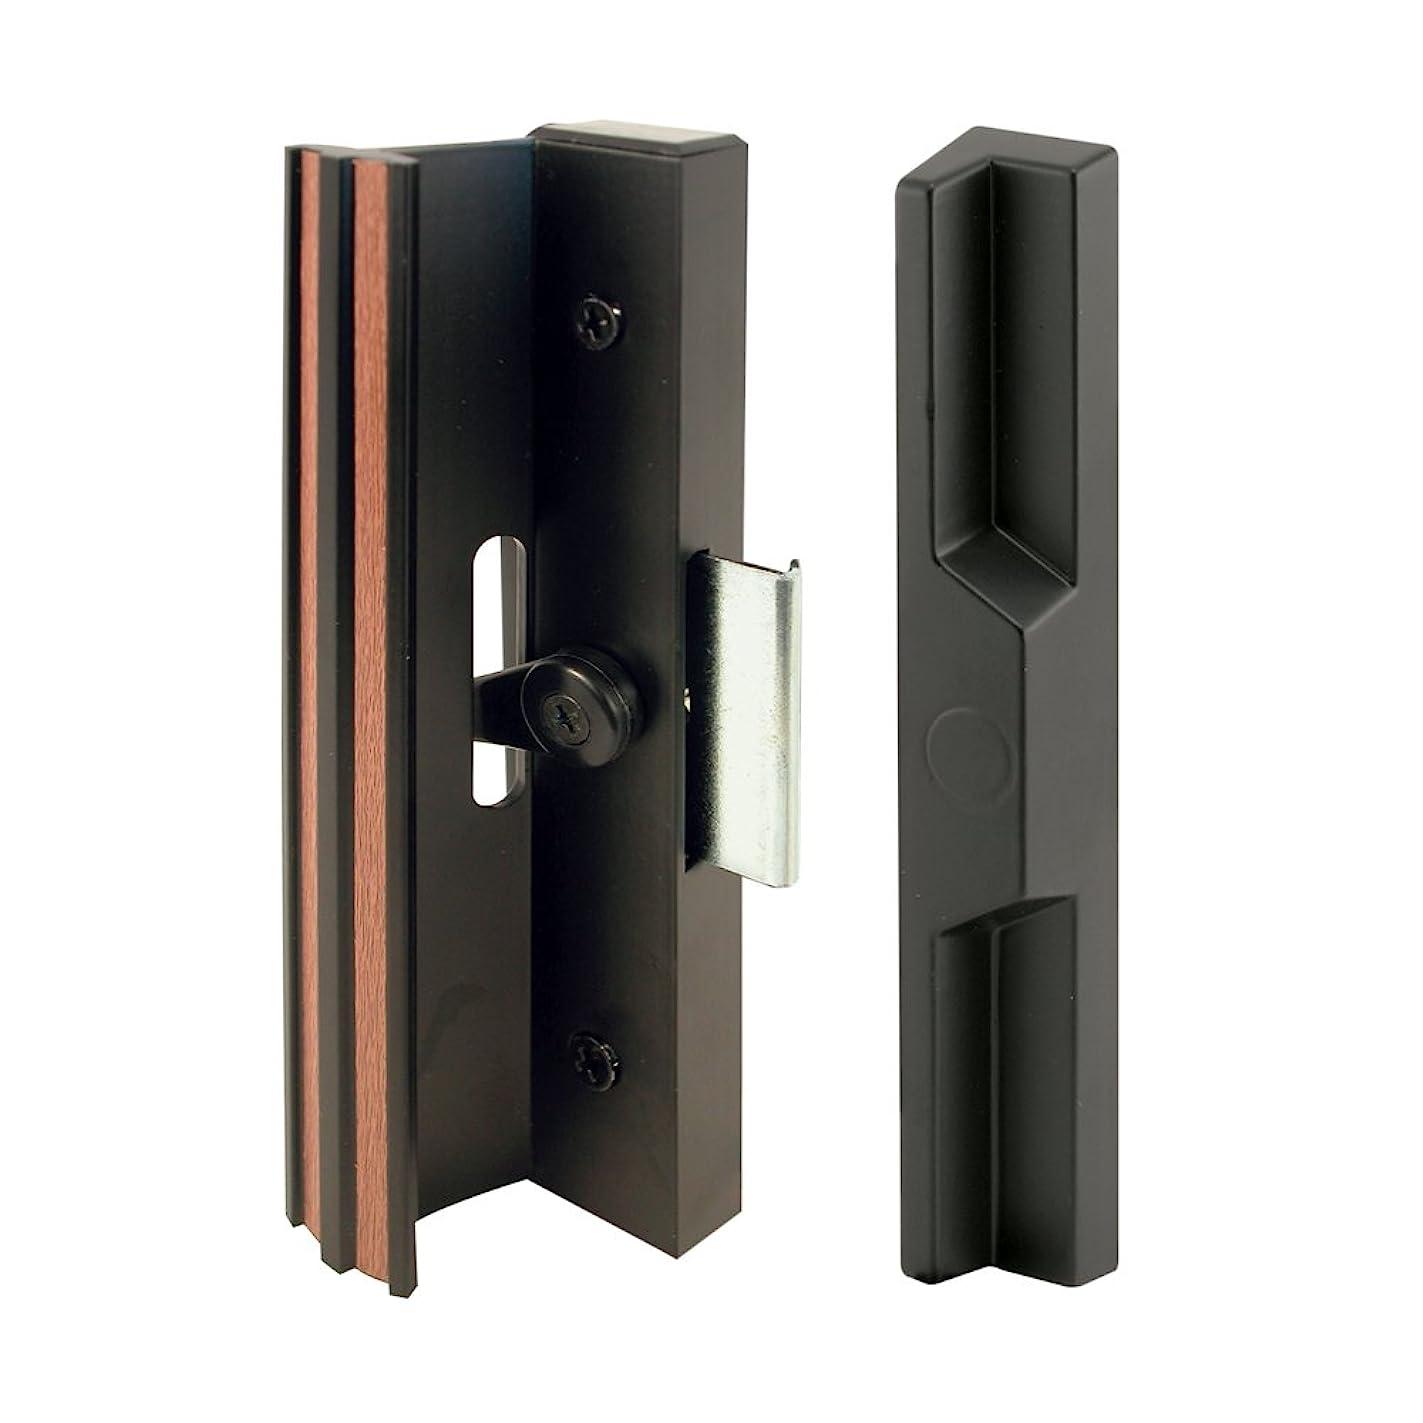 Prime-Line Products C 1106 Diecast Sliding Door Handle Set, Black Aluminum